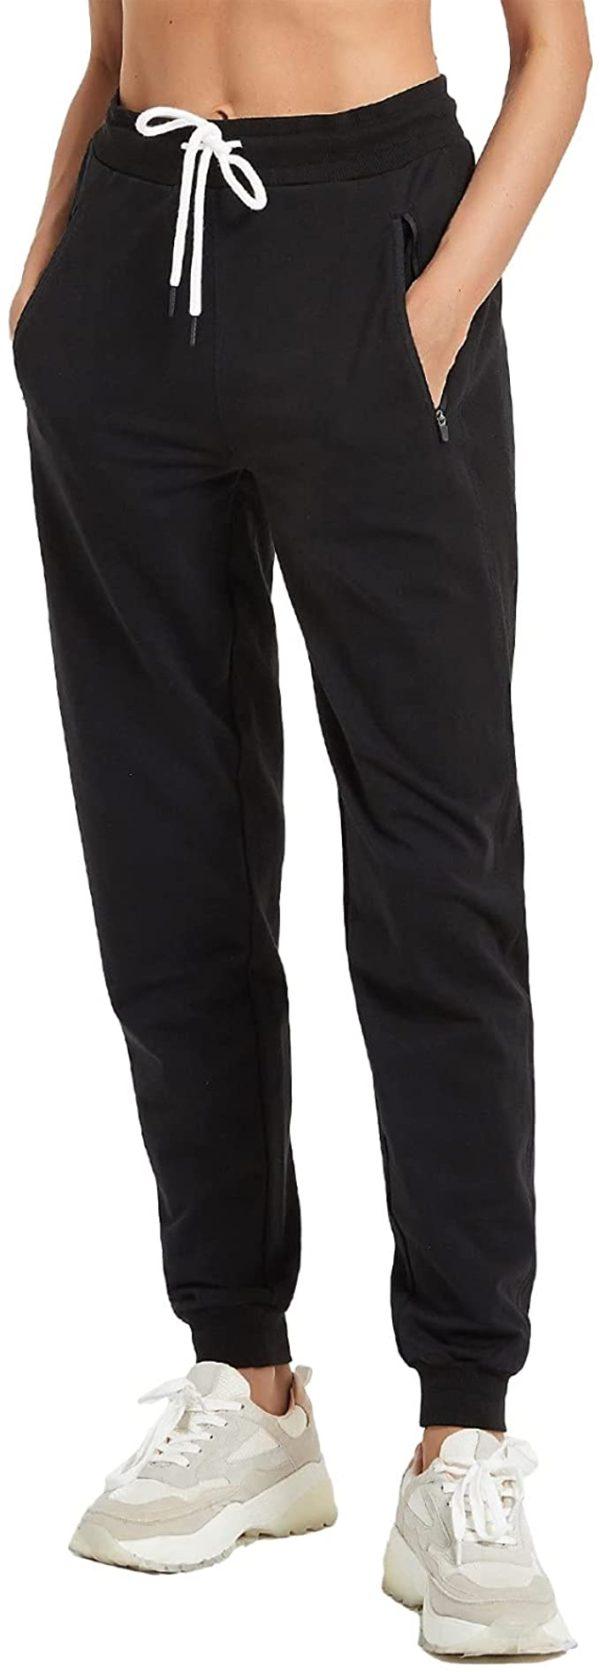 Pants with Zipper Pocket